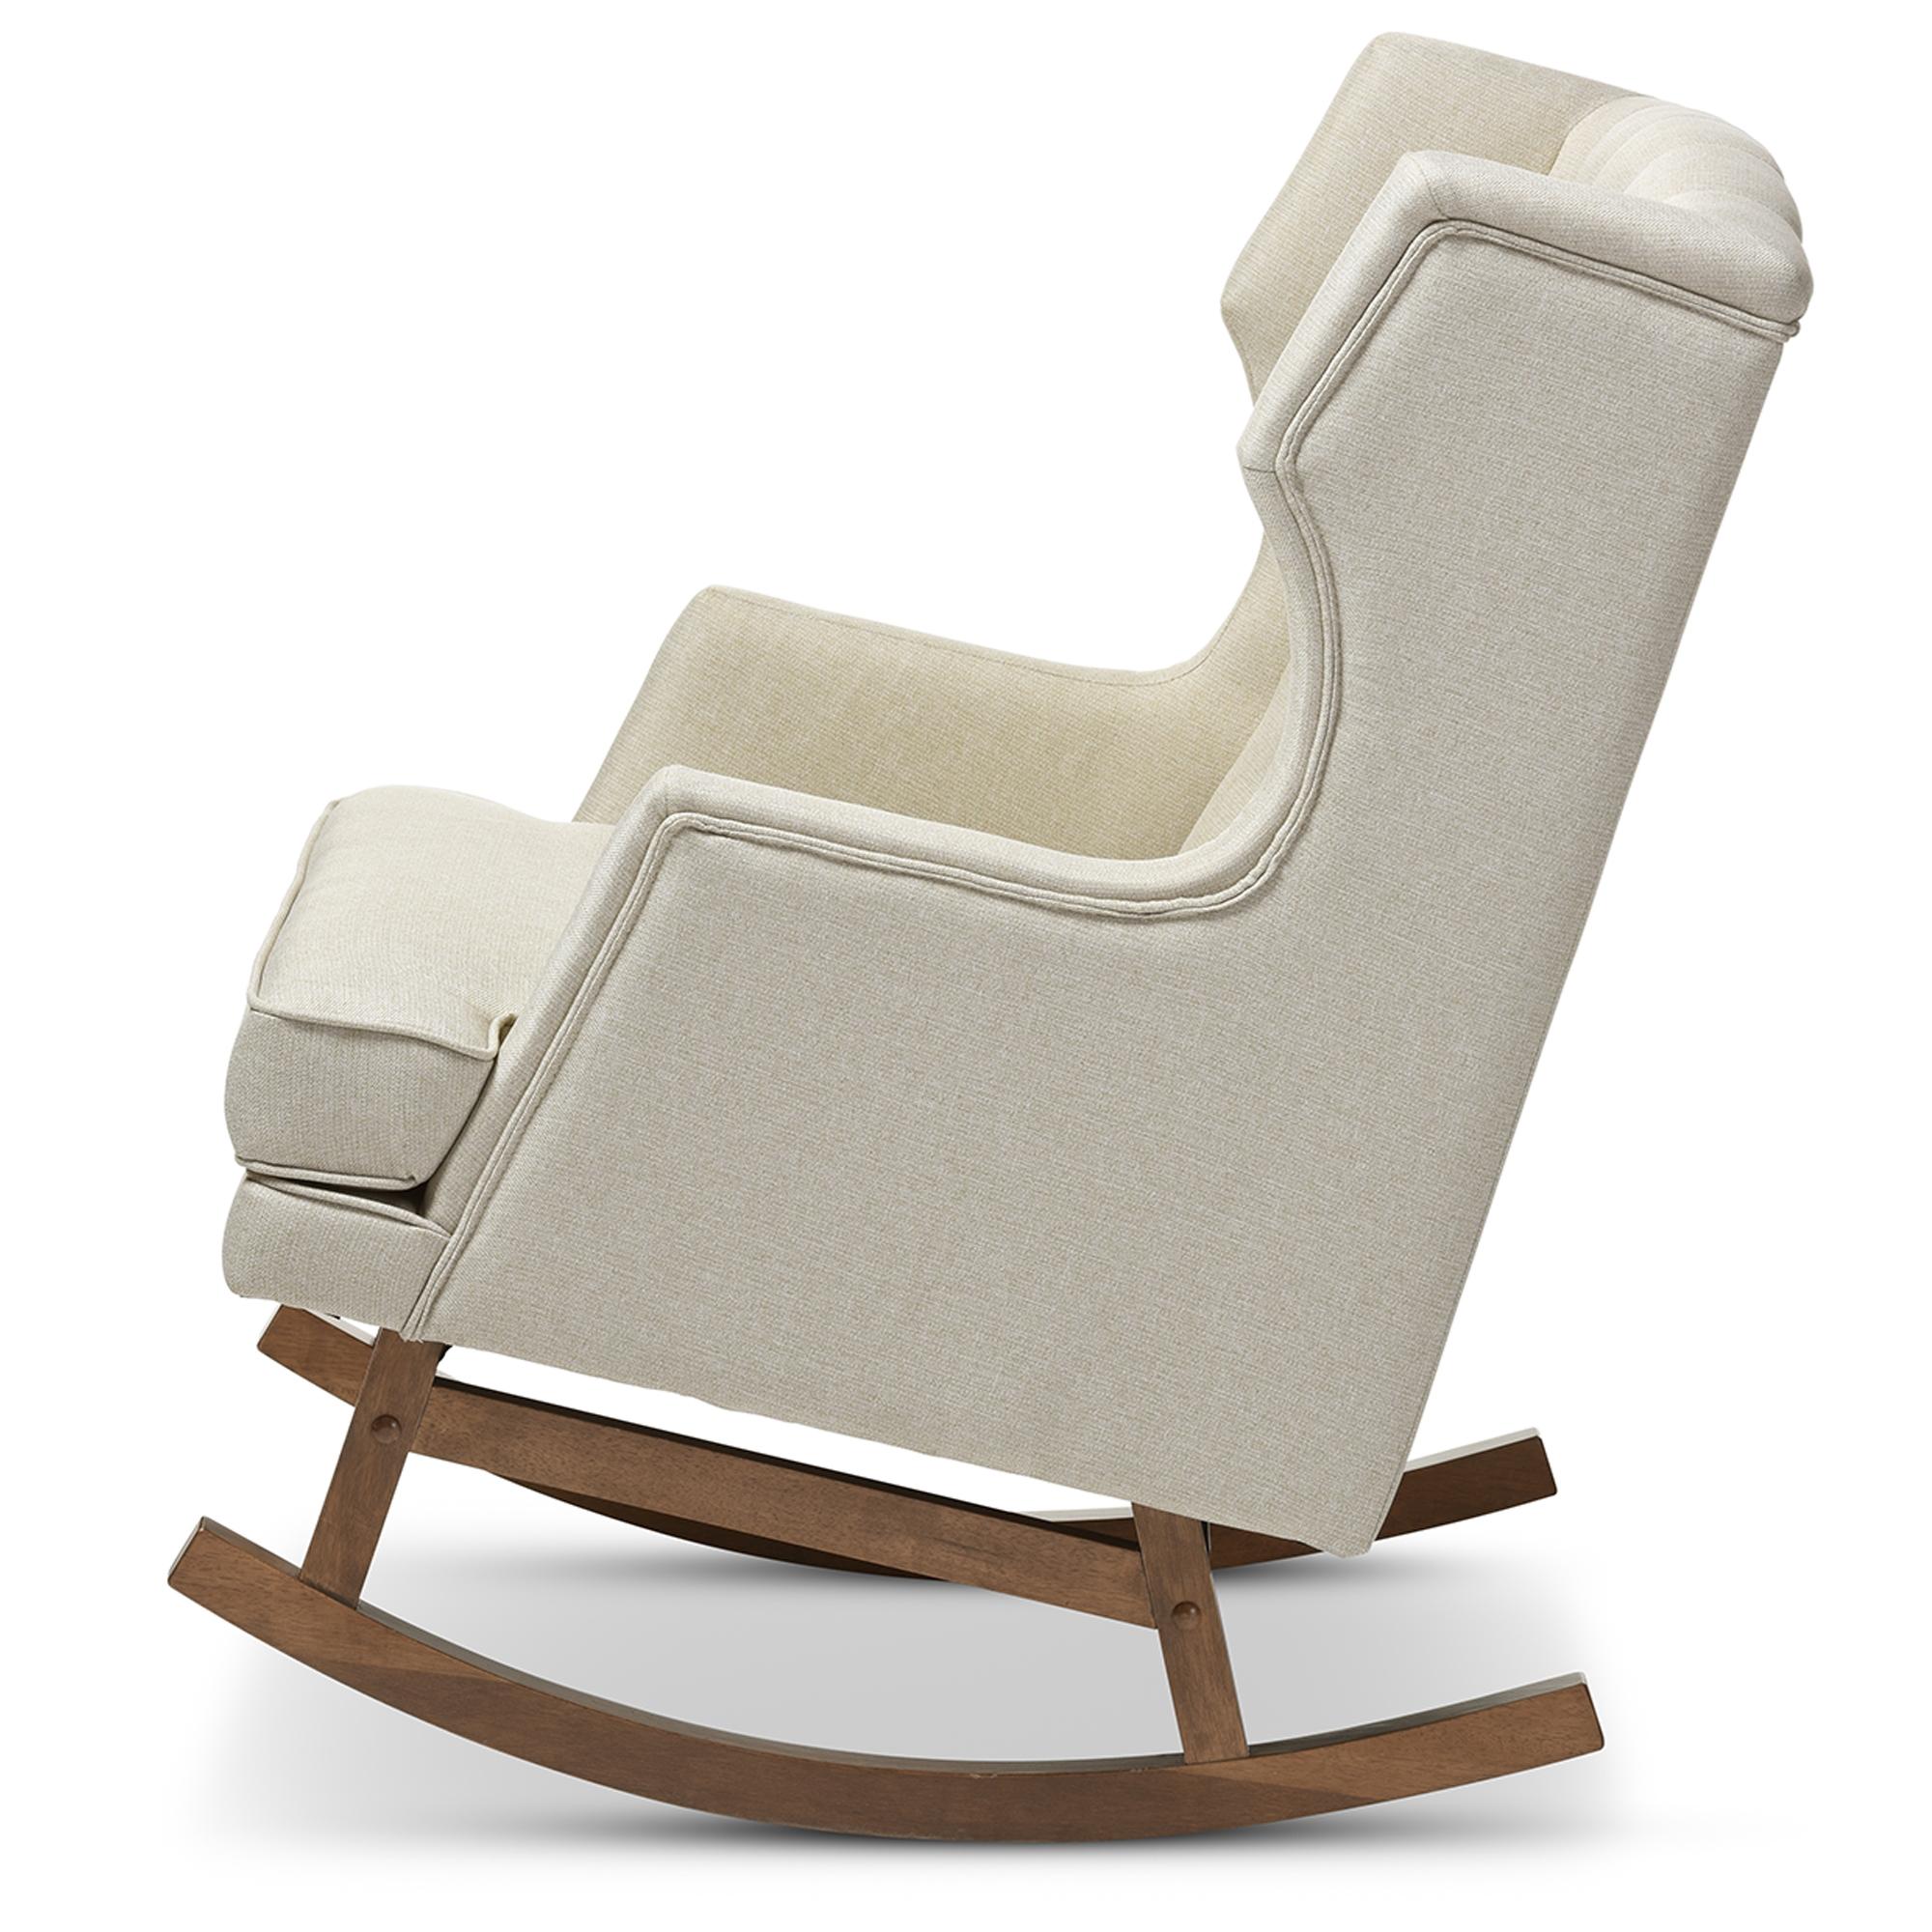 ... Baxton Studio Iona Mid Century Retro Modern Light Beige Fabric  Upholstered Button Tufted Wingback ...